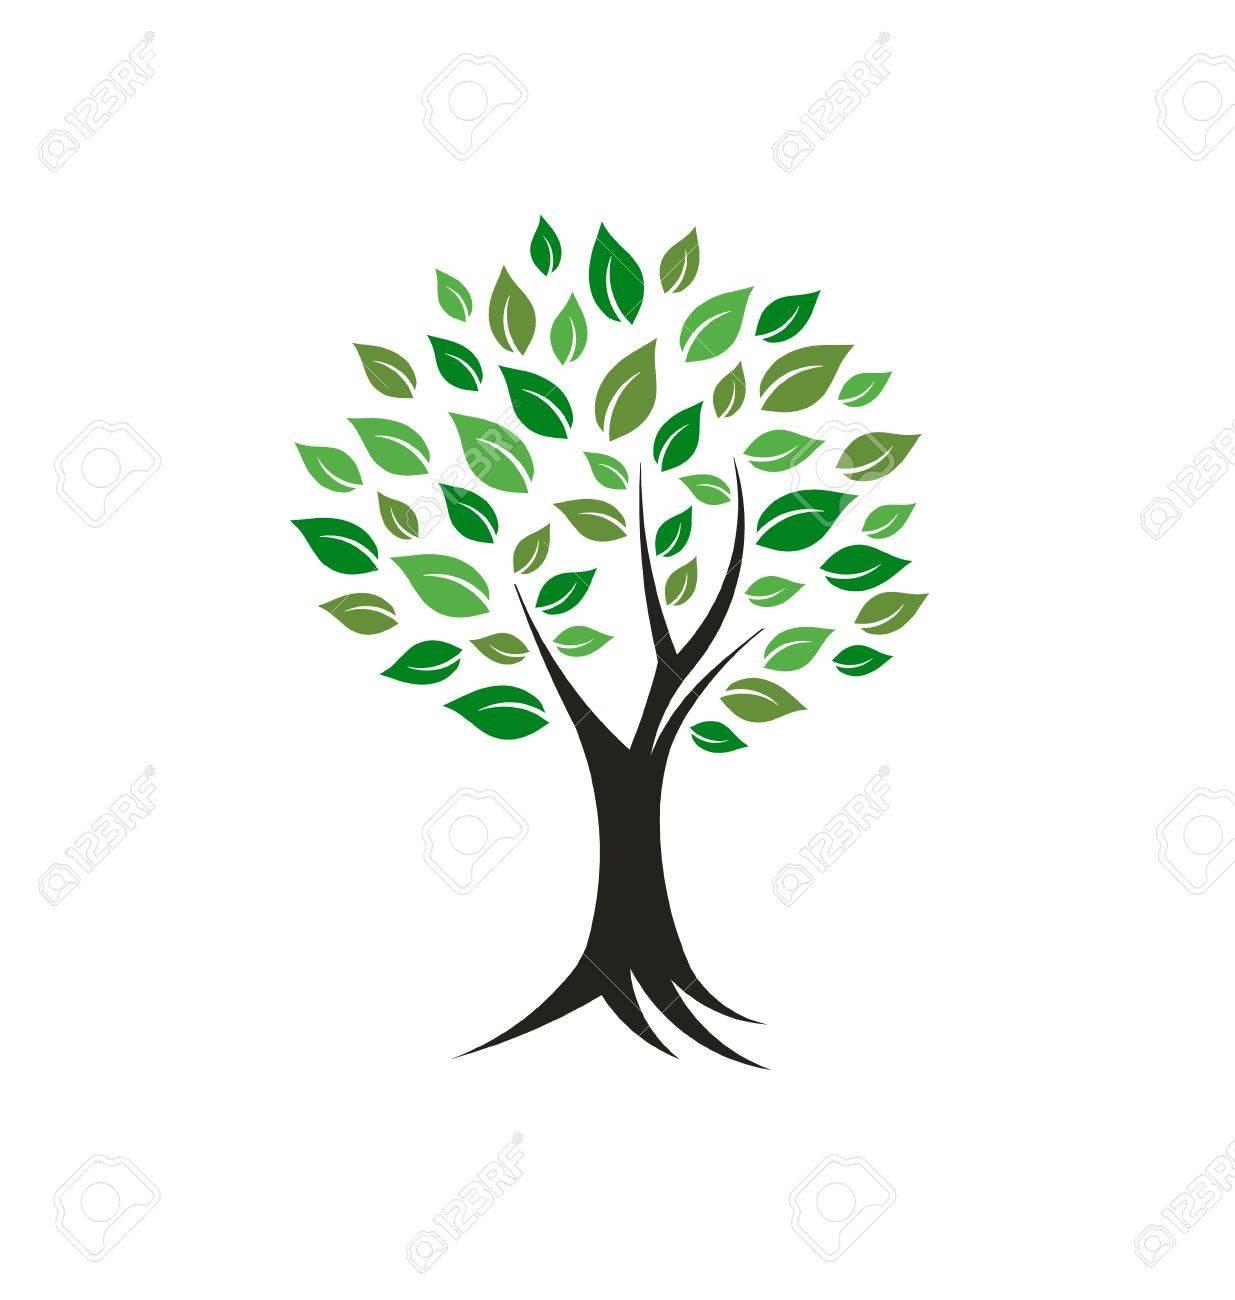 tree plant image concept